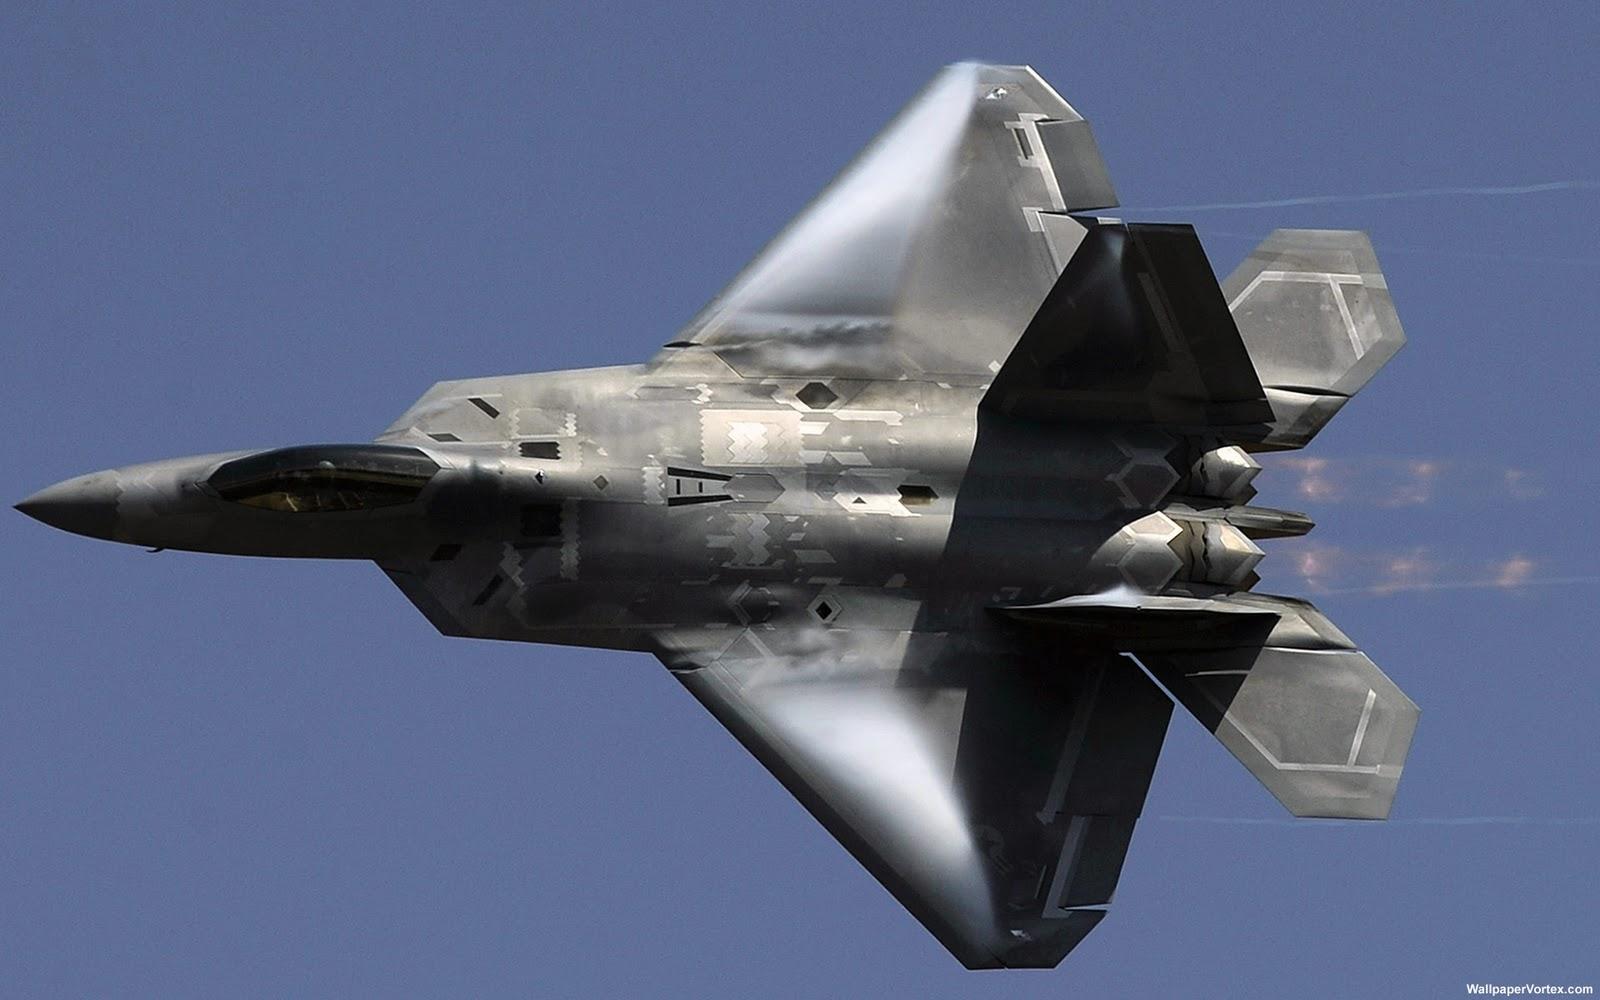 http://2.bp.blogspot.com/-MWRKzga-5Ac/Tyke-yOtLRI/AAAAAAAAA5w/rC5_3DeaNGU/s1600/2555-military_f_22_raptor_wallpaper.jpg